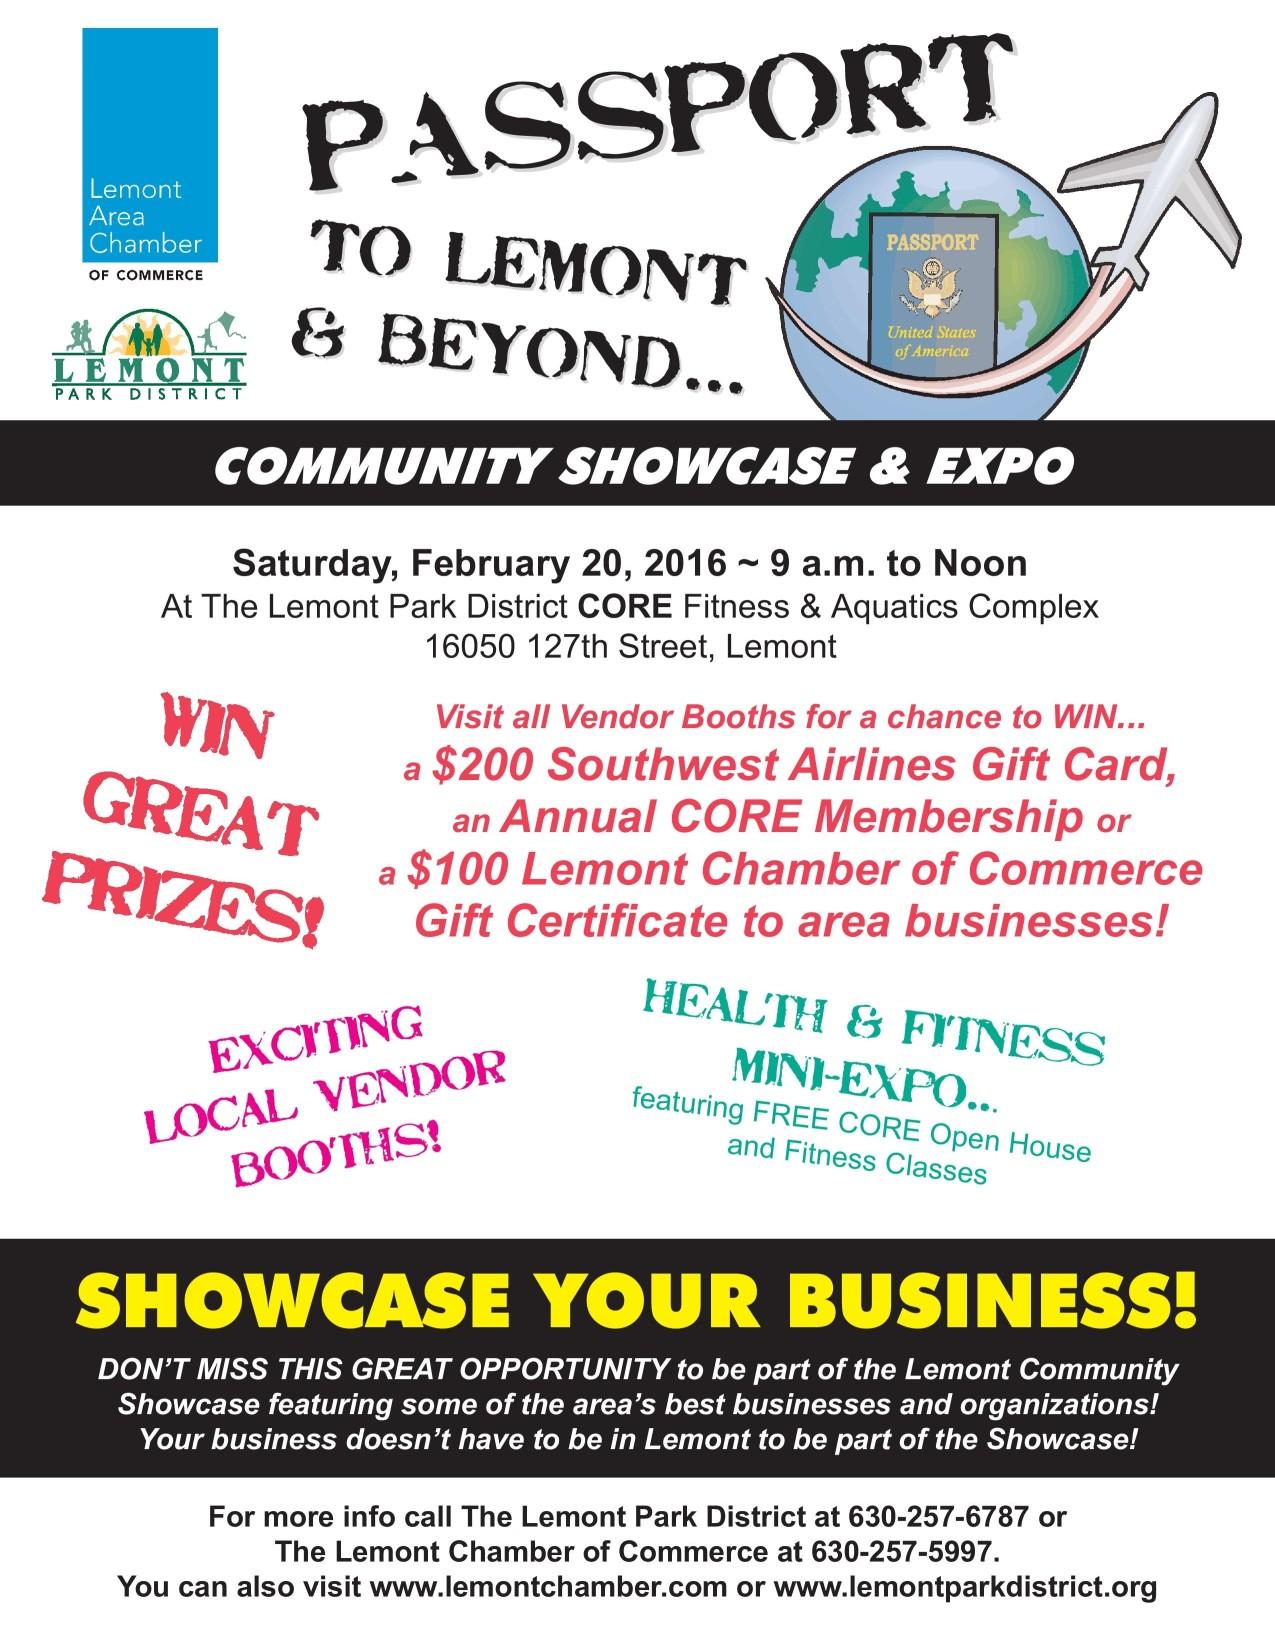 Lemont_Community_Showcase_2016-page-001-w1275.jpg